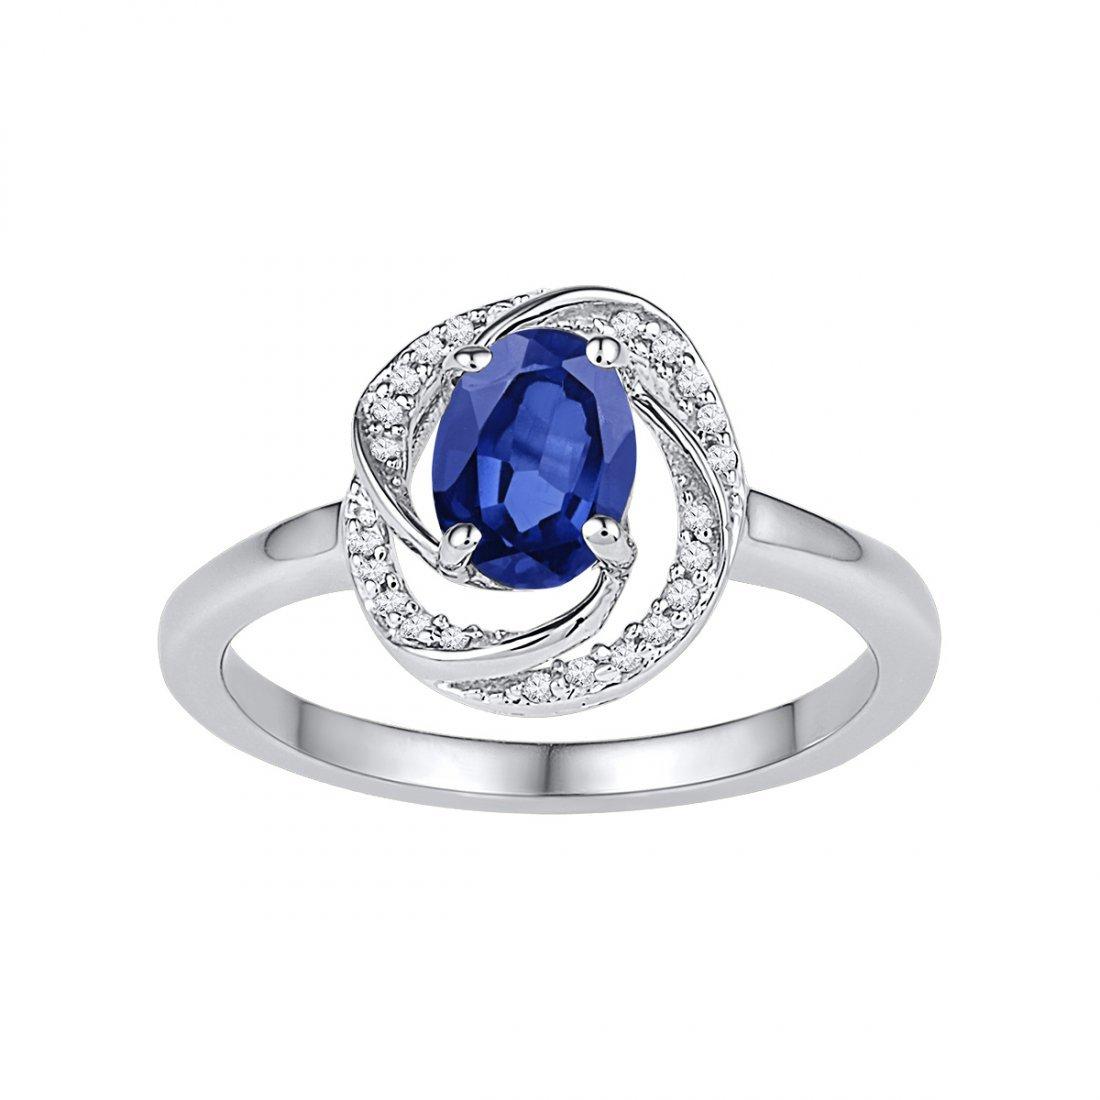 1.29 CTW Sapphire & Diamond Ladies Ring 10KT White Gold